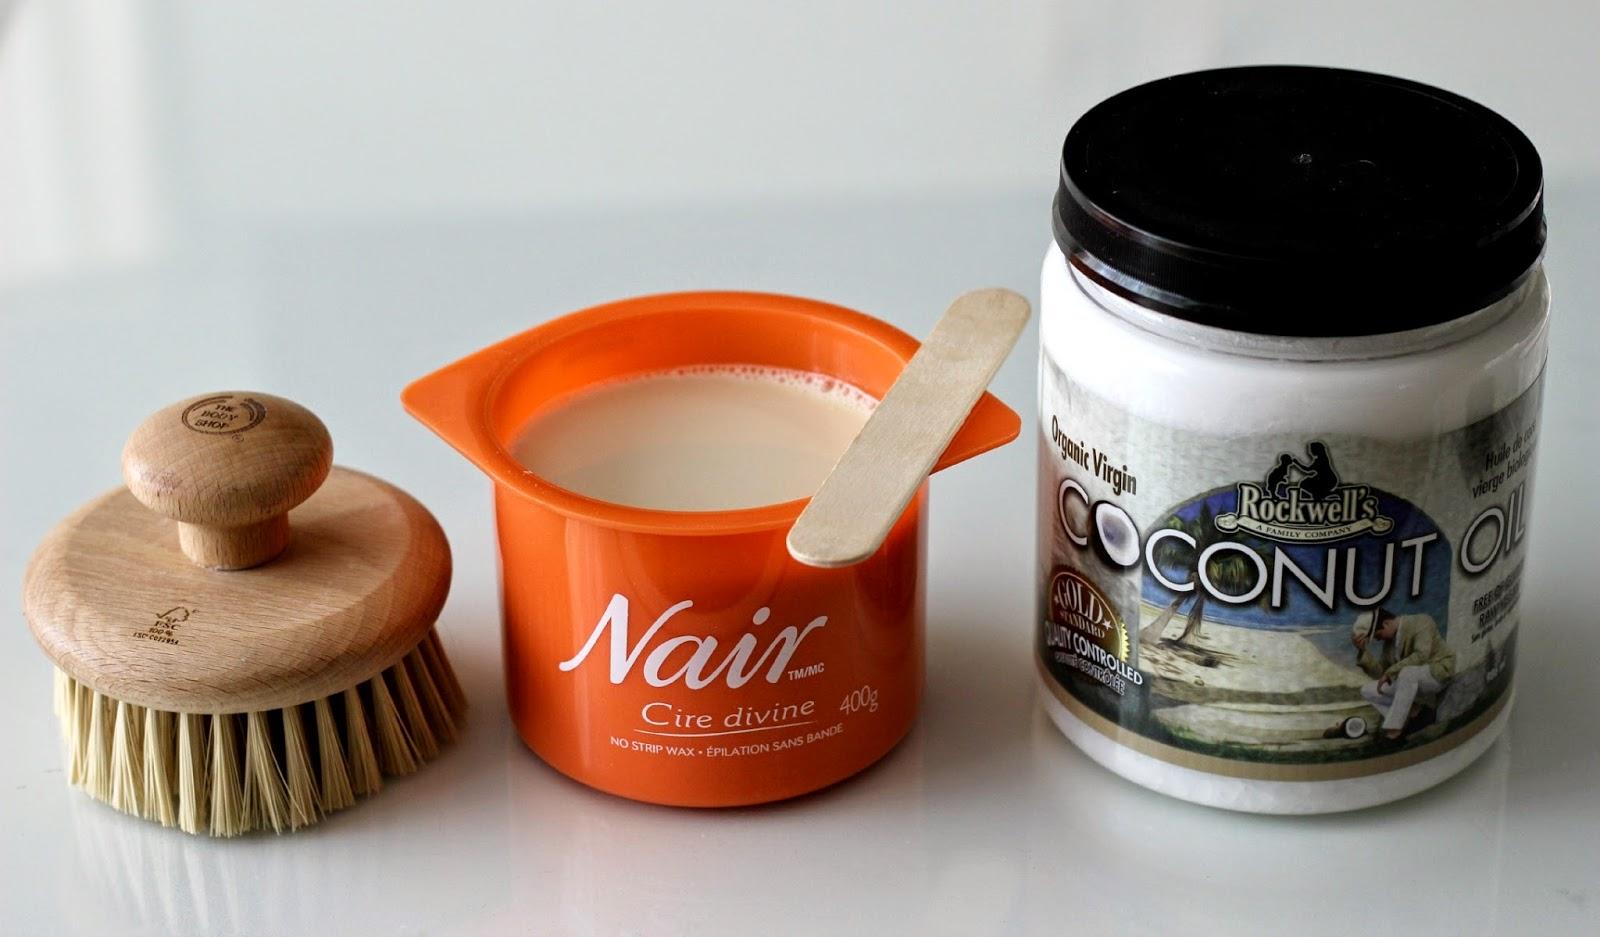 Nair Cire Divine Moroccan Argan Oil Wax